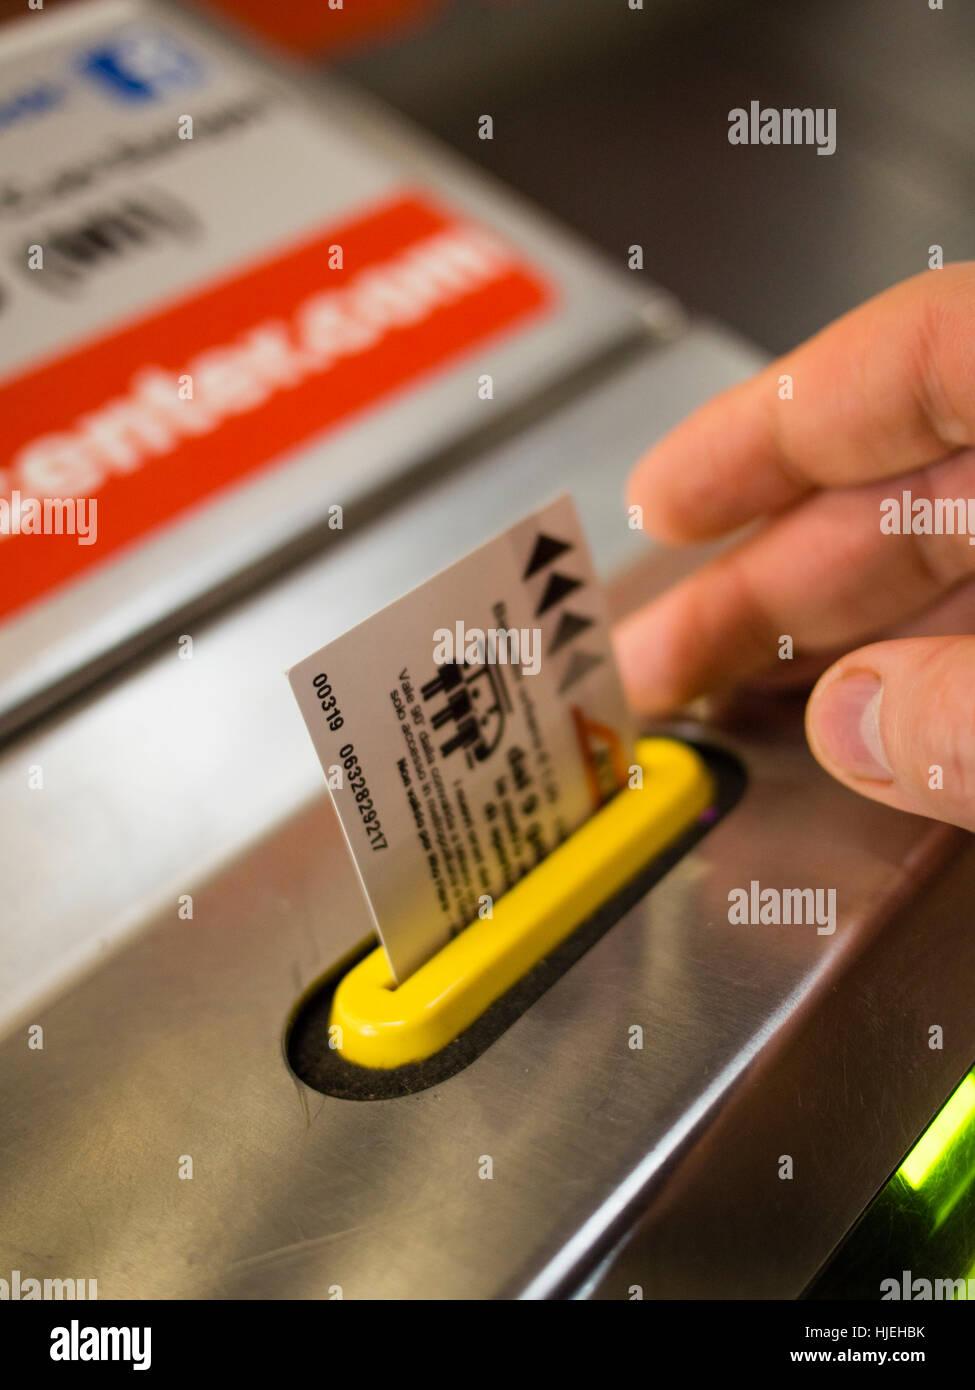 Ticket validation at the Milan Metro - Subway. - Stock Image